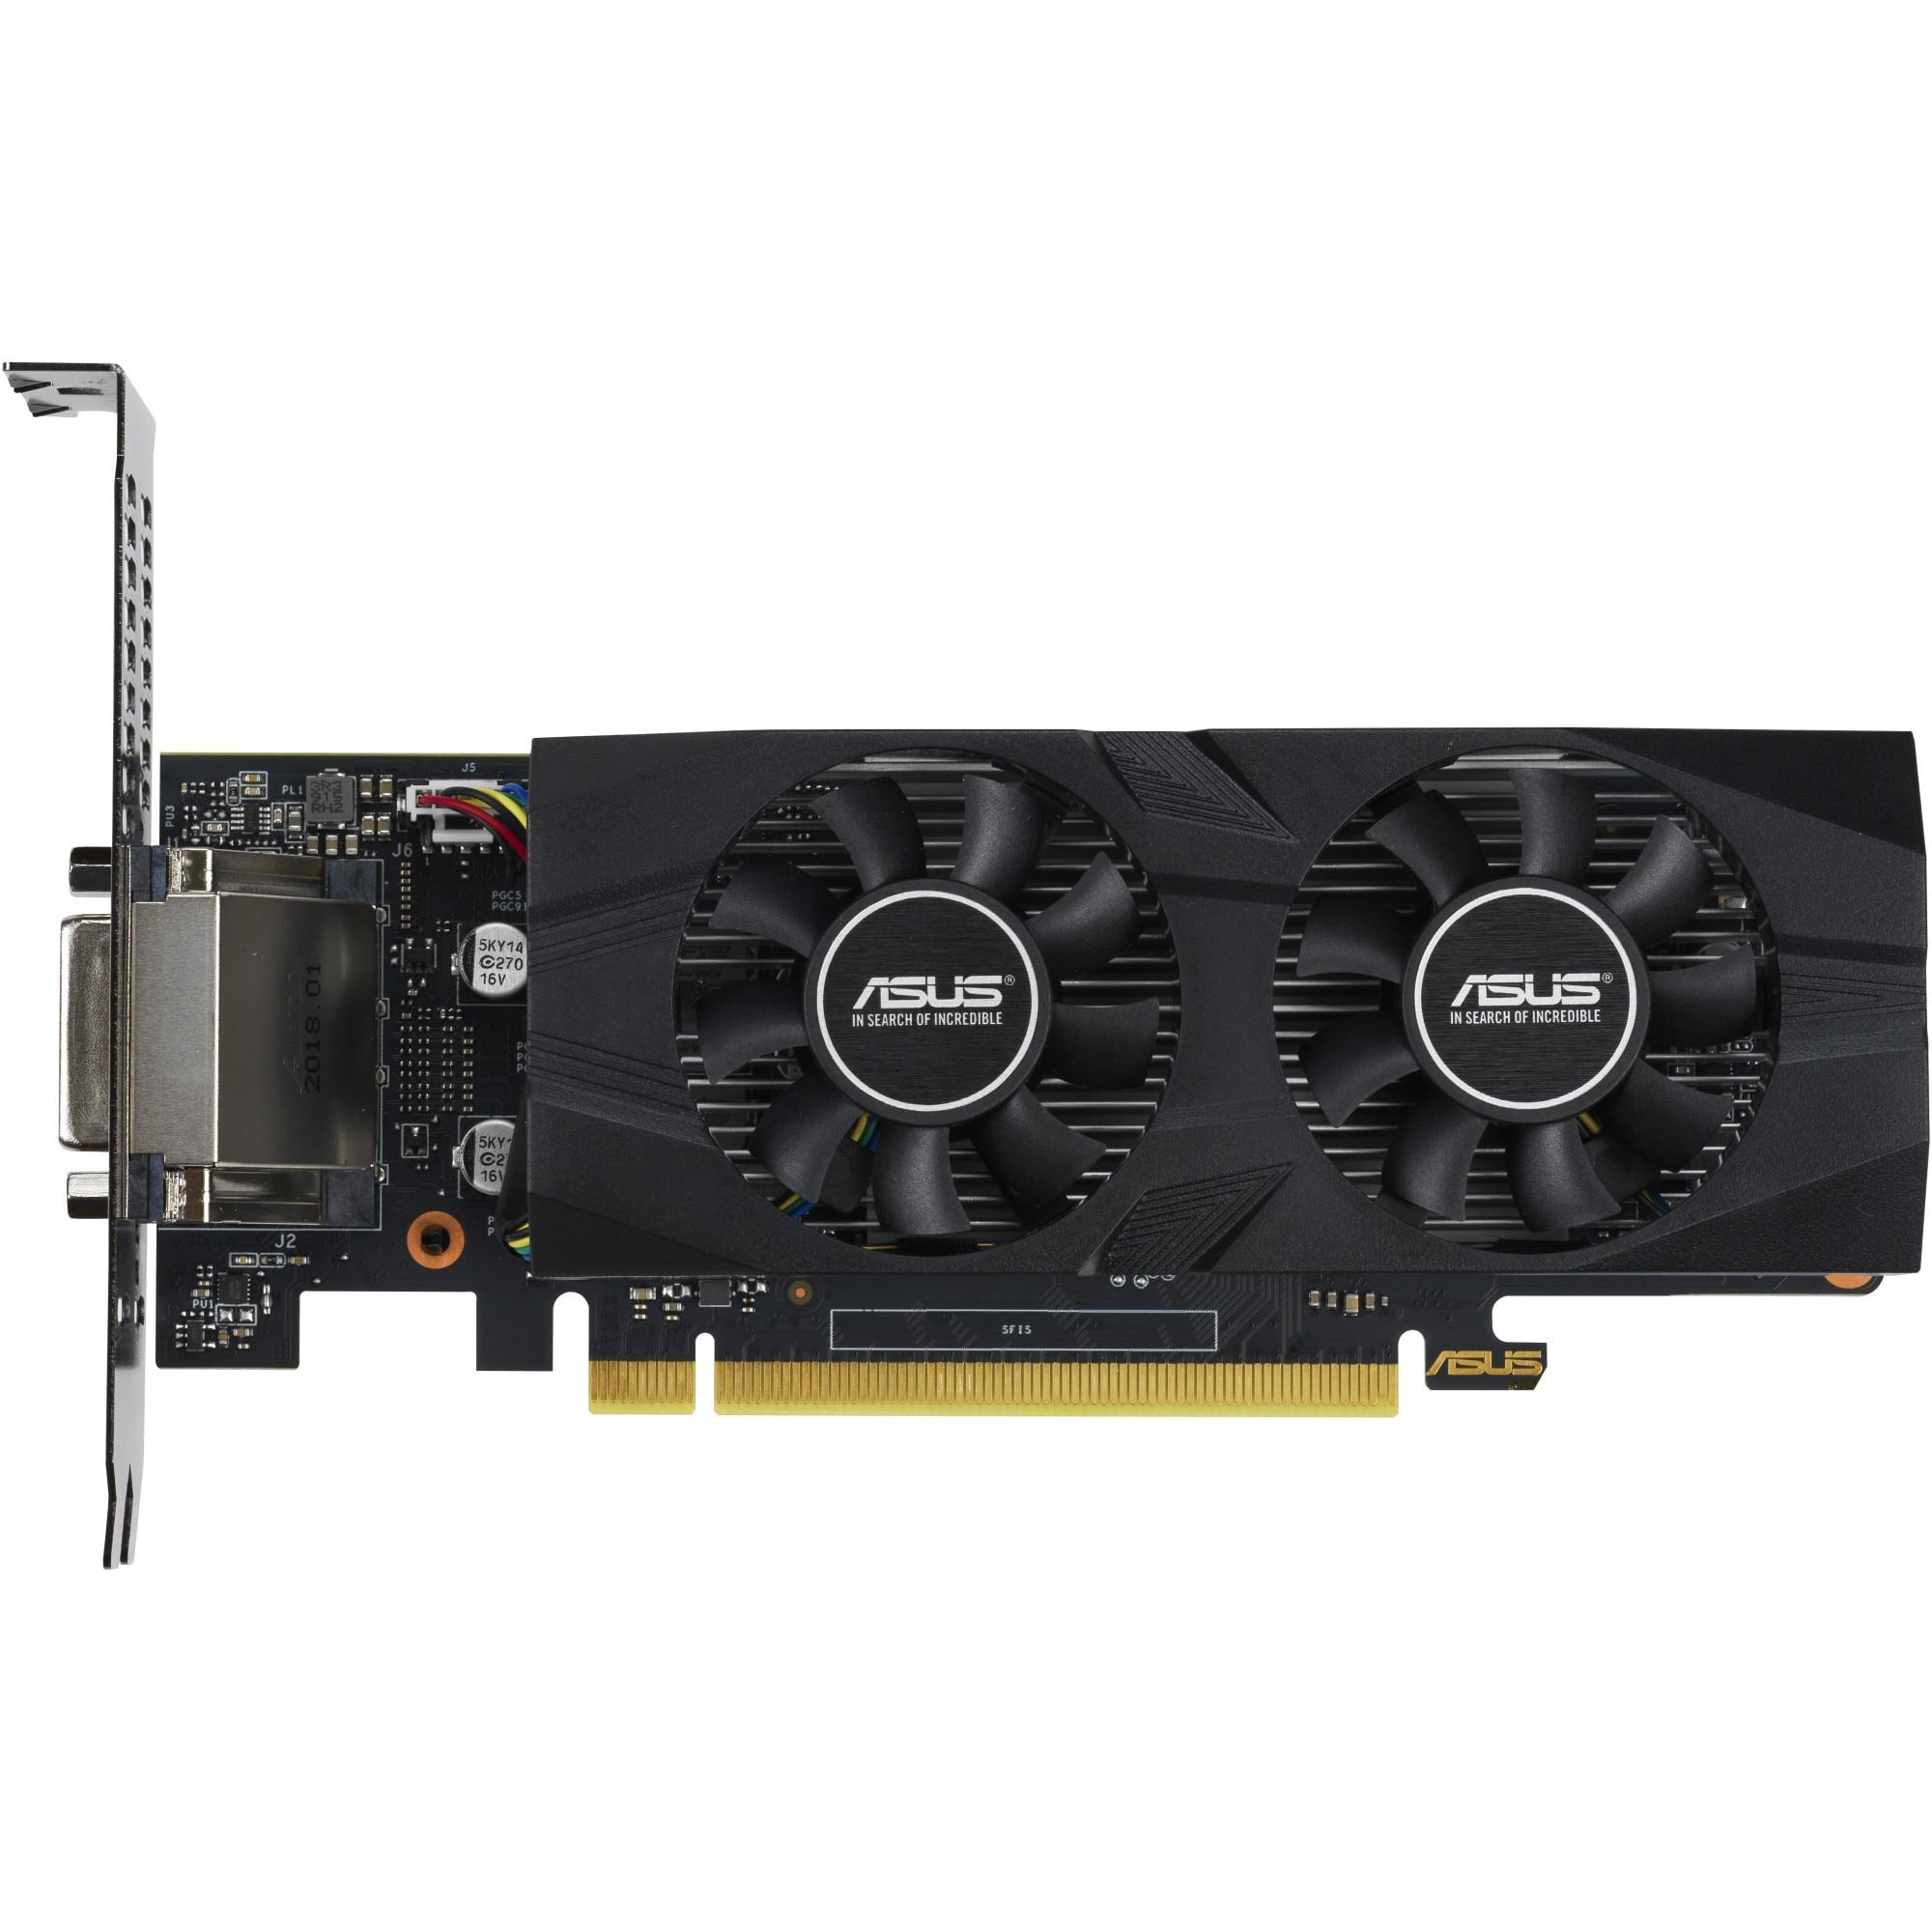 Fotografie Placa video ASUS GeForce GTX 1650 LP, 4GB GDDR5, 128-bit